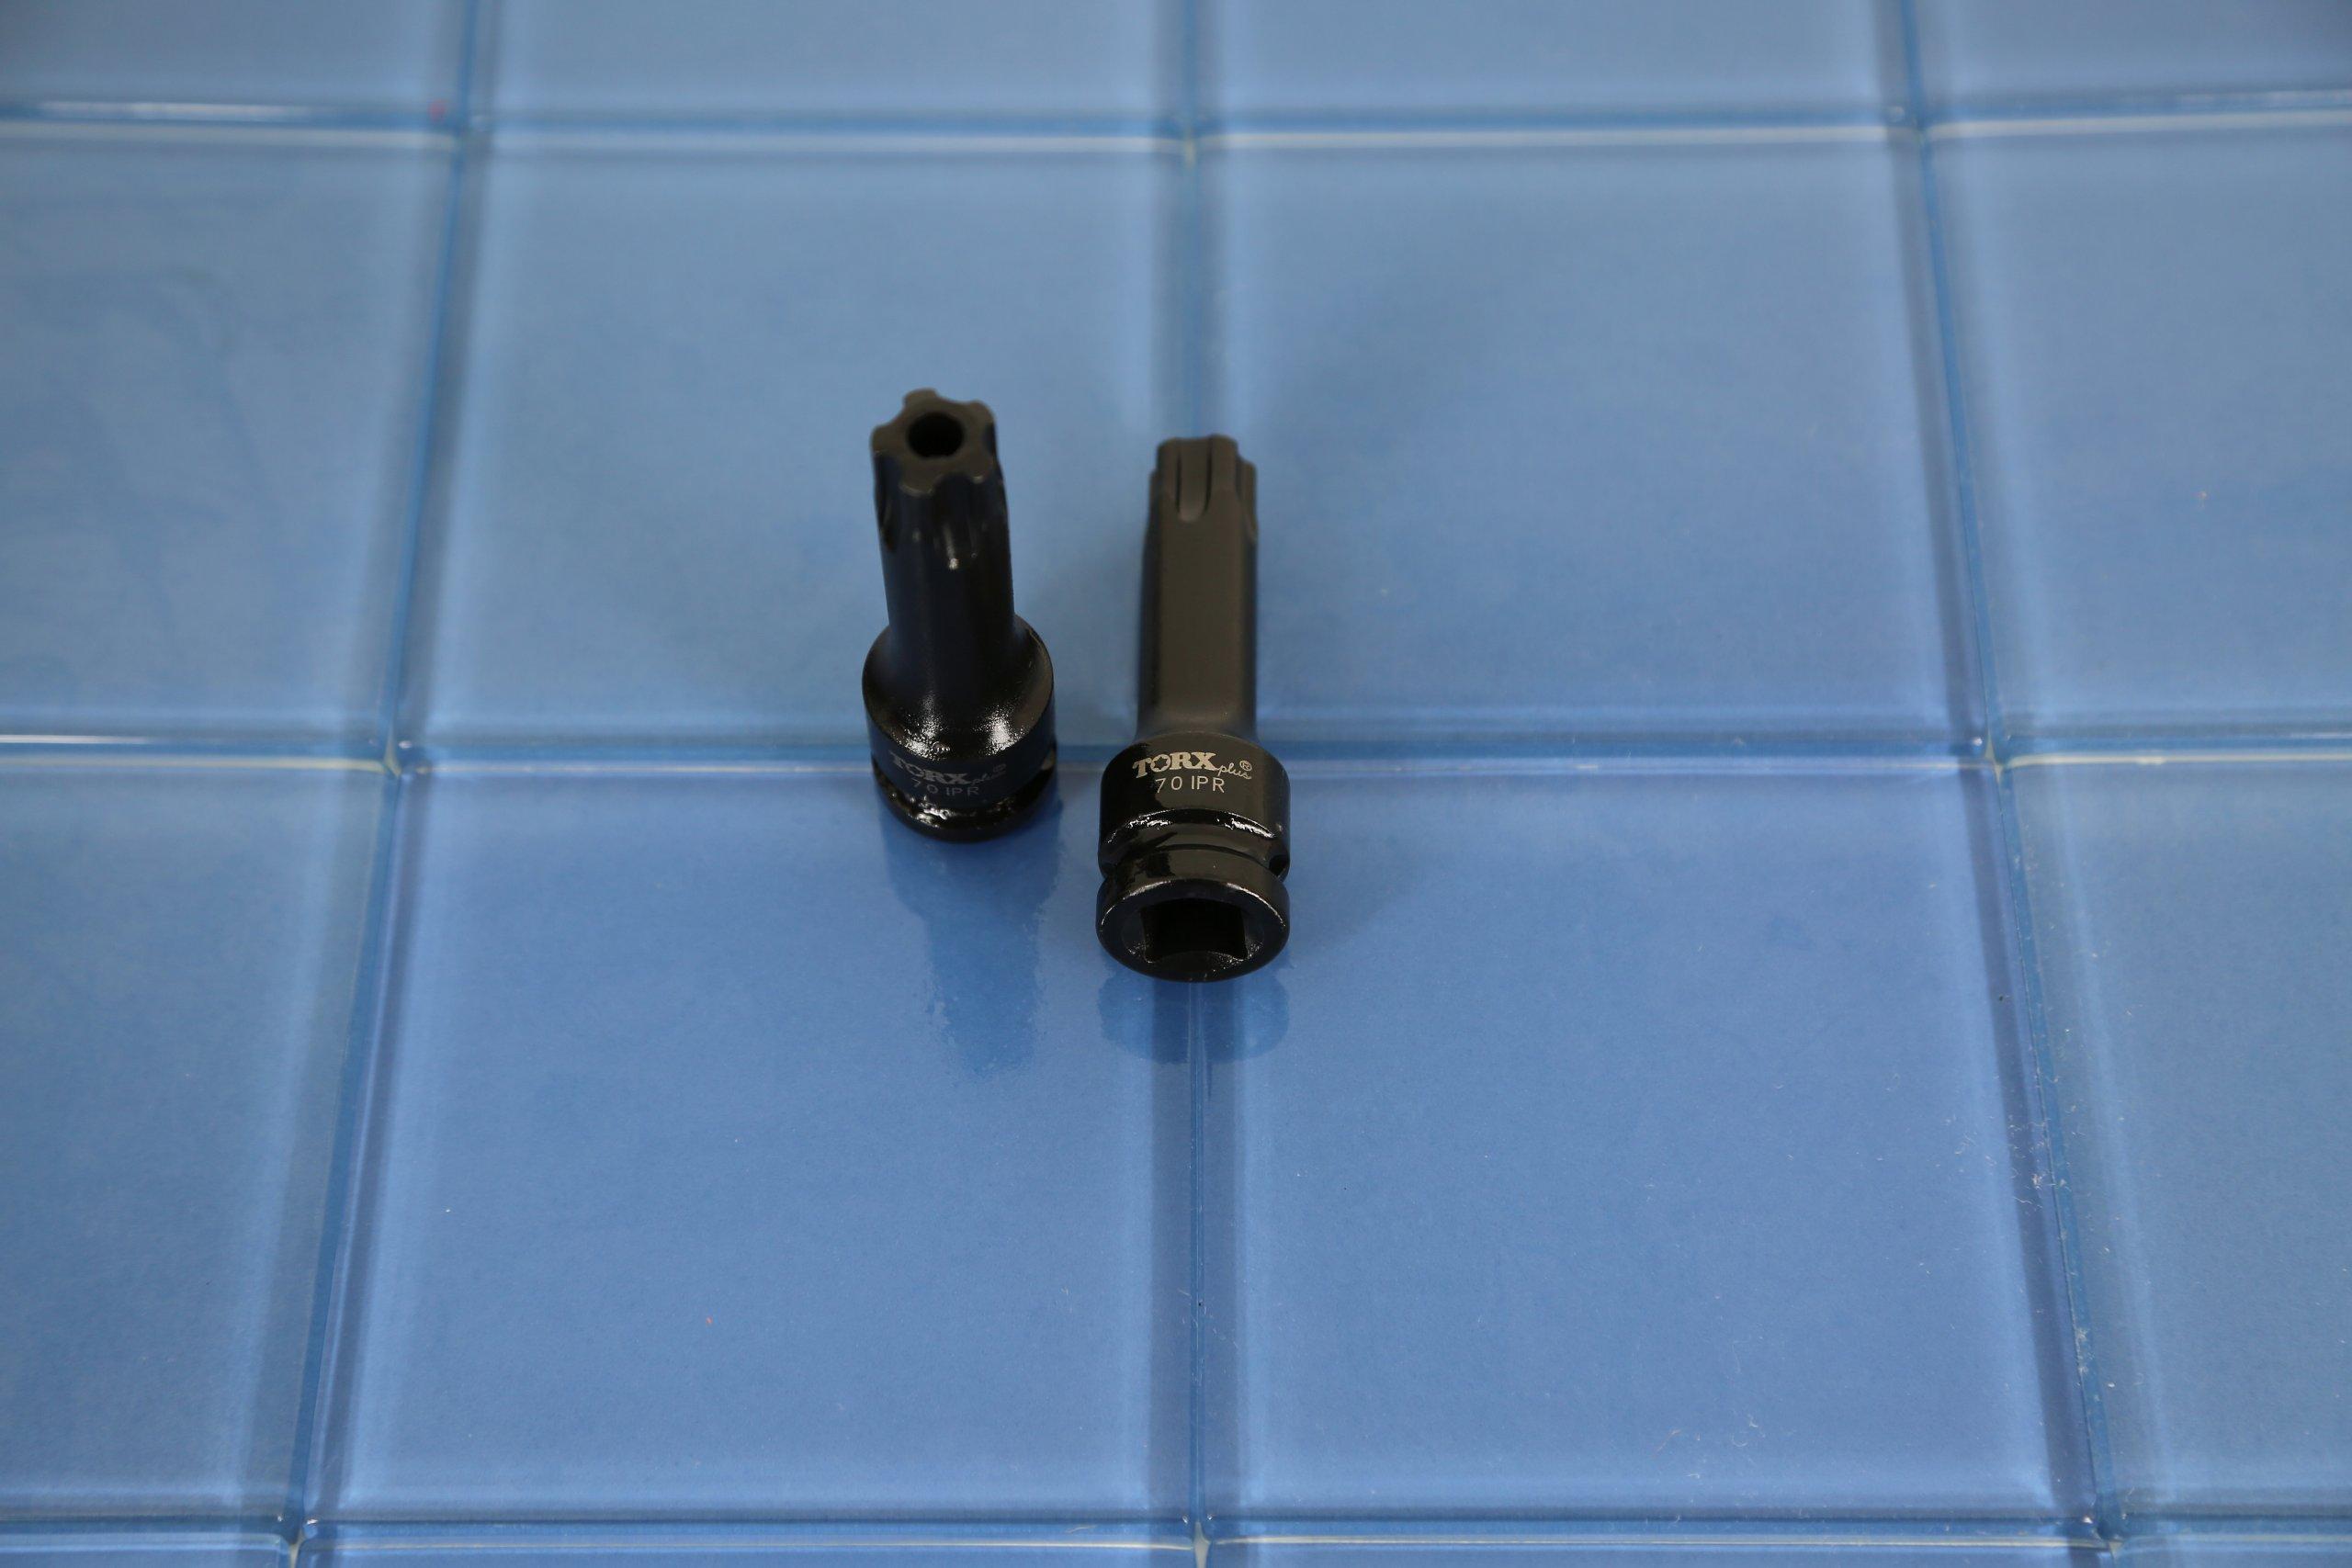 TEMO 9 PC 3 inch (76mm) Long Tamper Proof Torx Plus IPR 5 point Black Impact Bit Socket Set 1/2 inch (12.7mm) Square Drive Auto Repair Tool